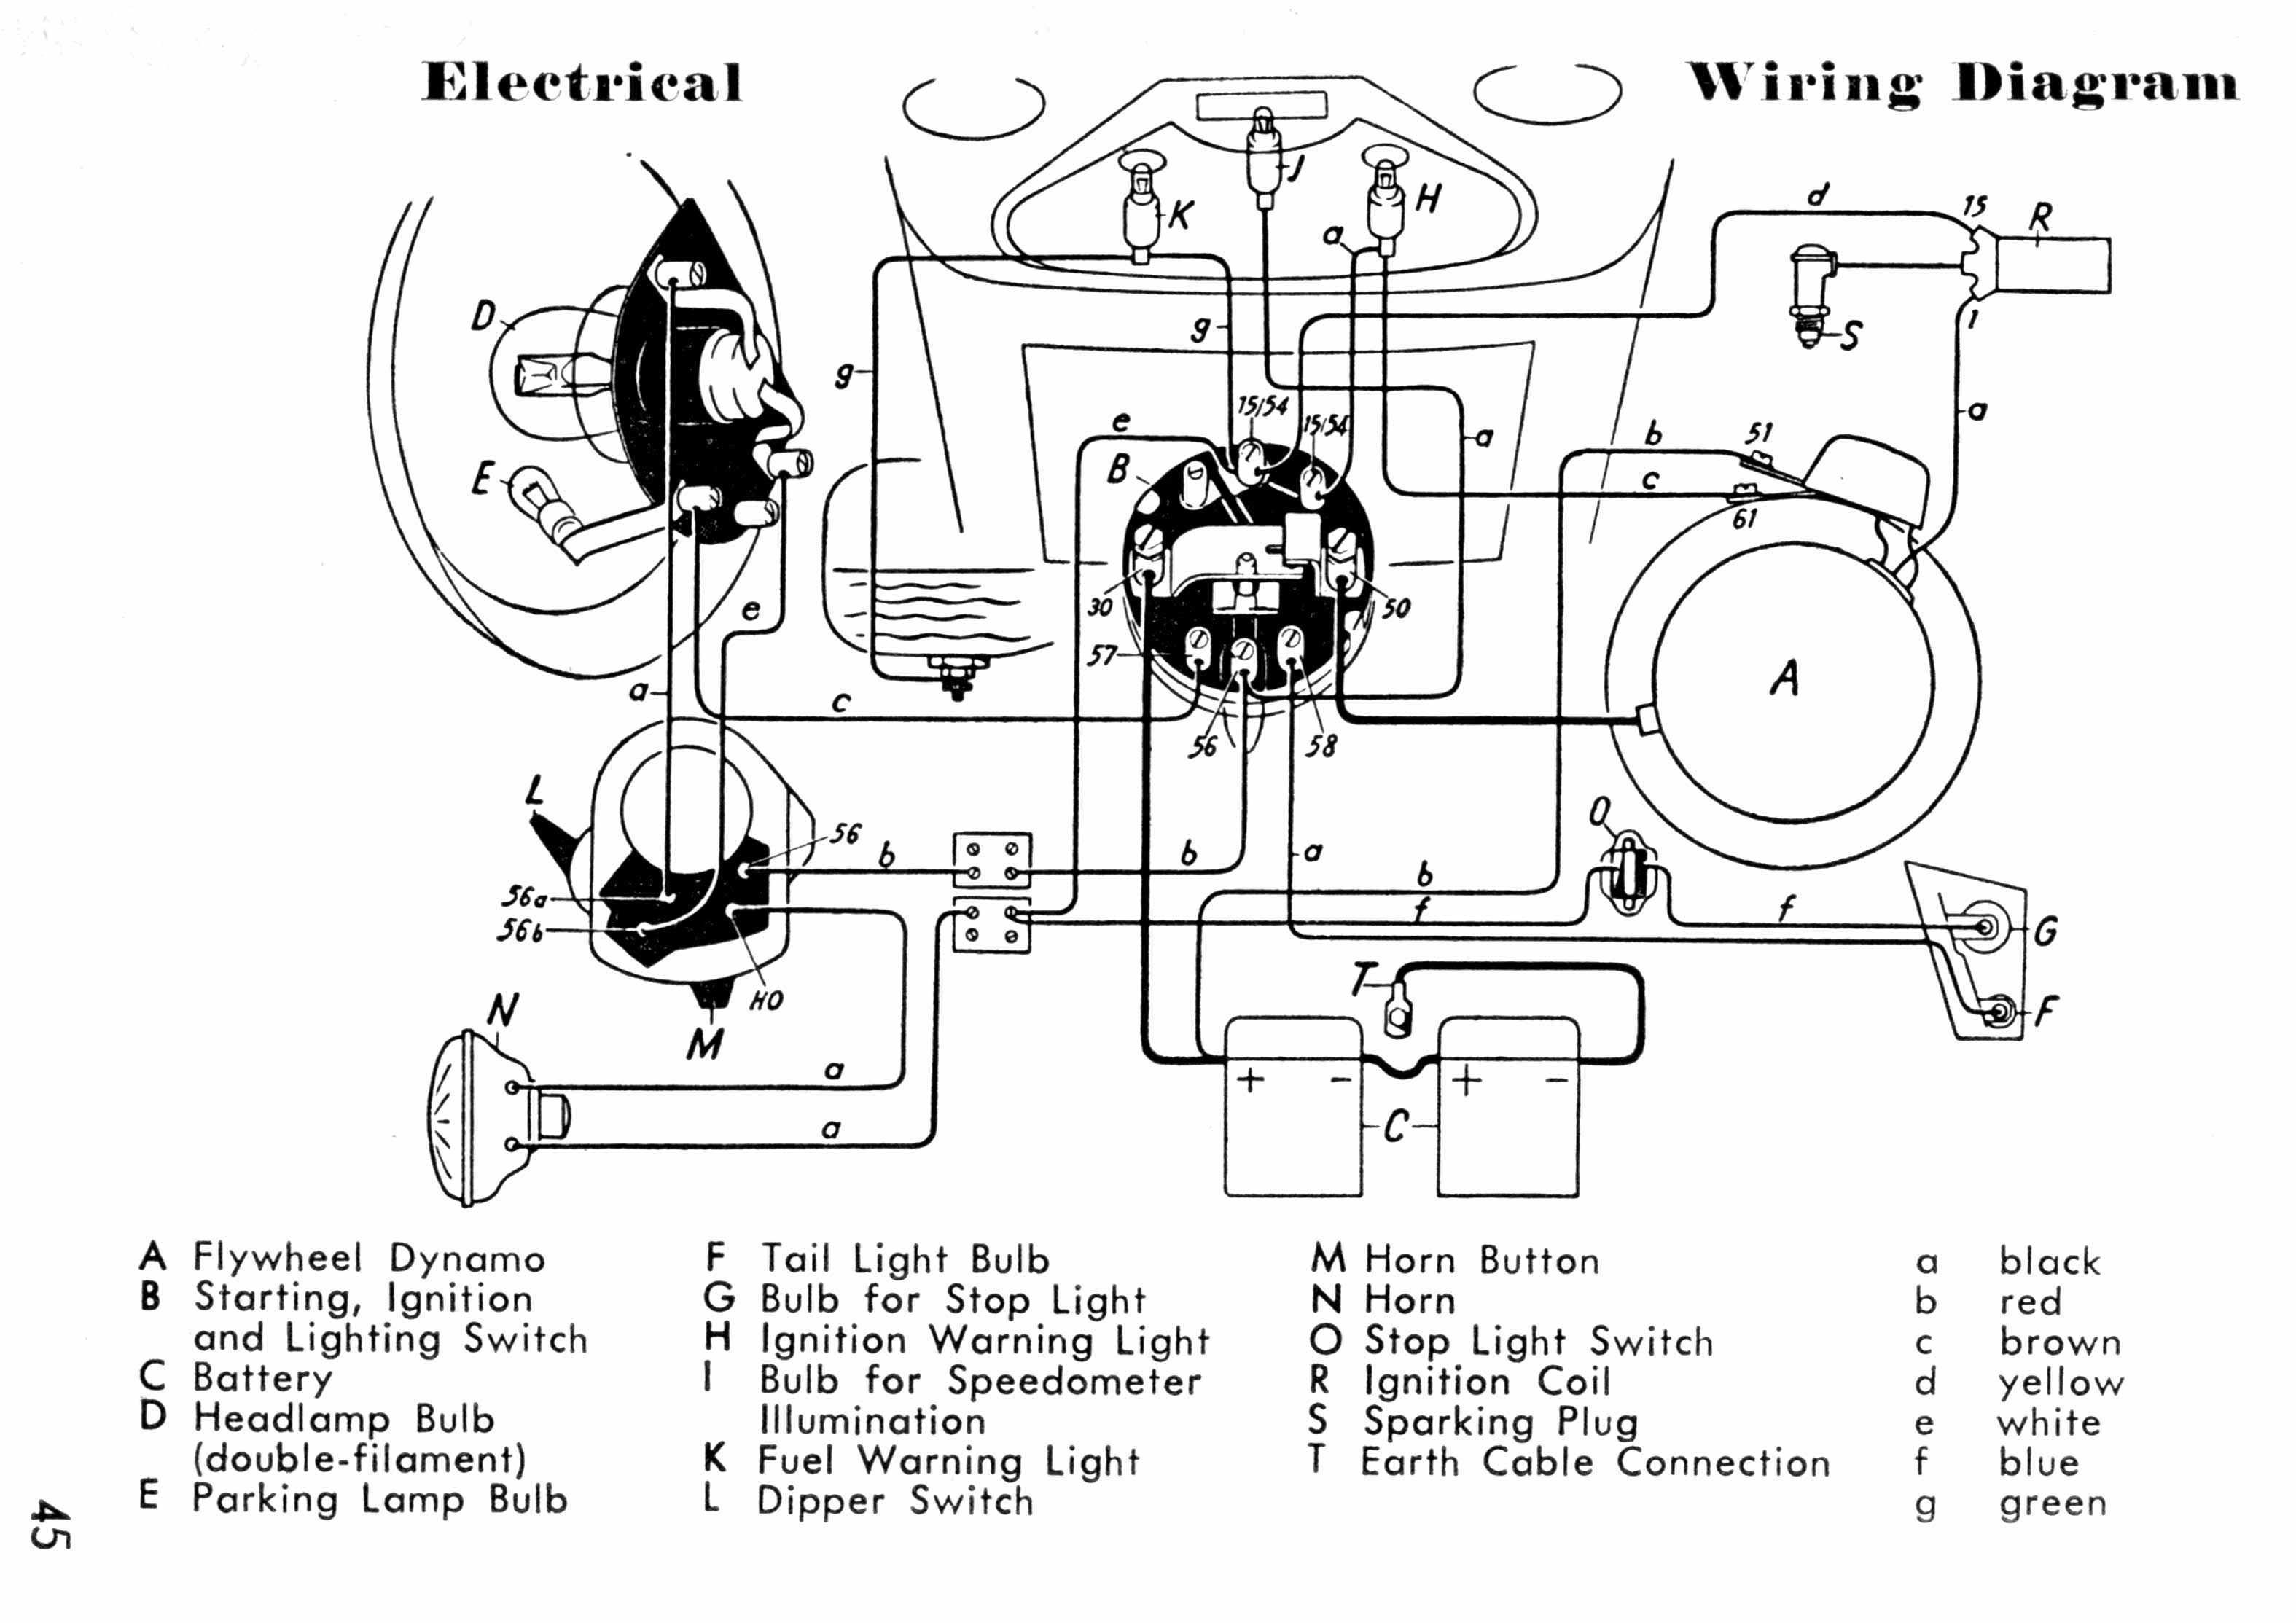 Sunl Dirt Bike Wiring Diagram 2000 Gmc Jimmy Radio Pulg 50cc Wire Data Schematic Electric Scooter Closet Pinterest Roketa